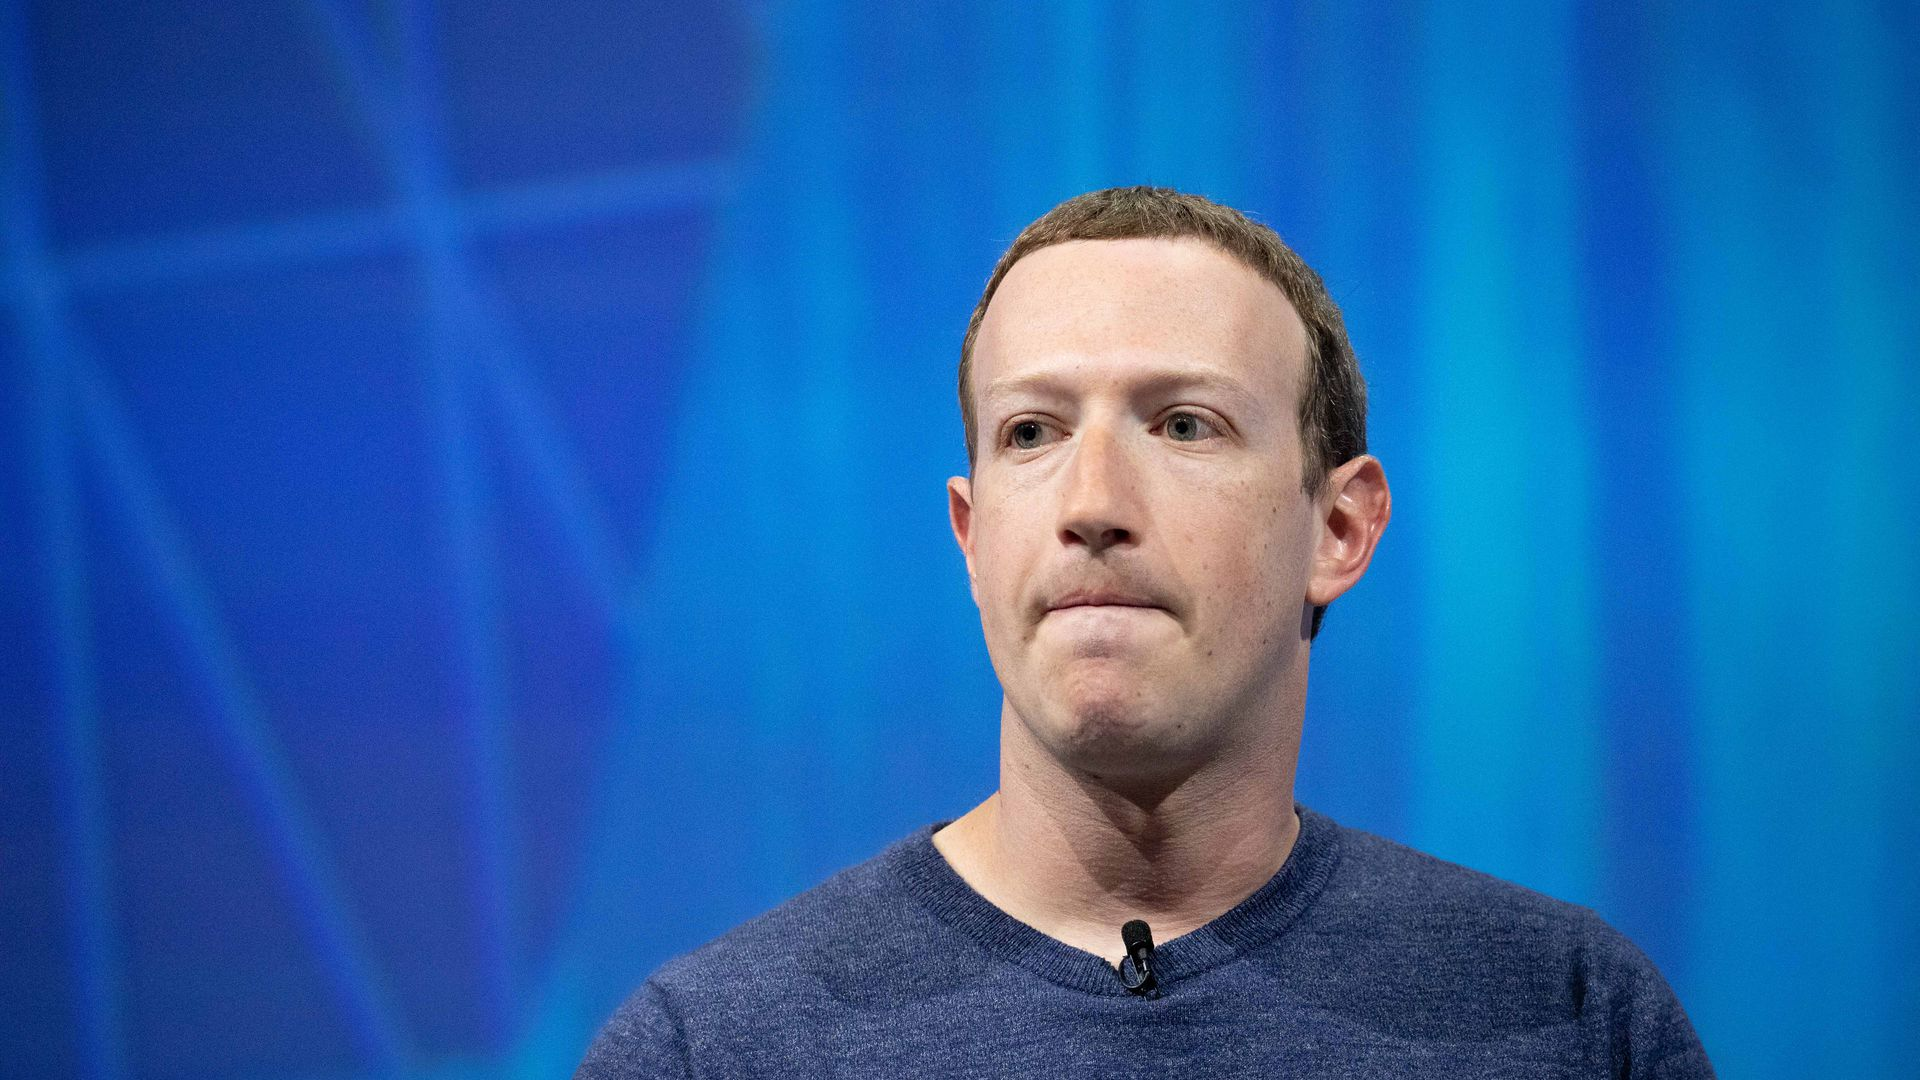 Facebook data leak, .brian acton,delete facebook, mark zuckerberg, privacy on facebook